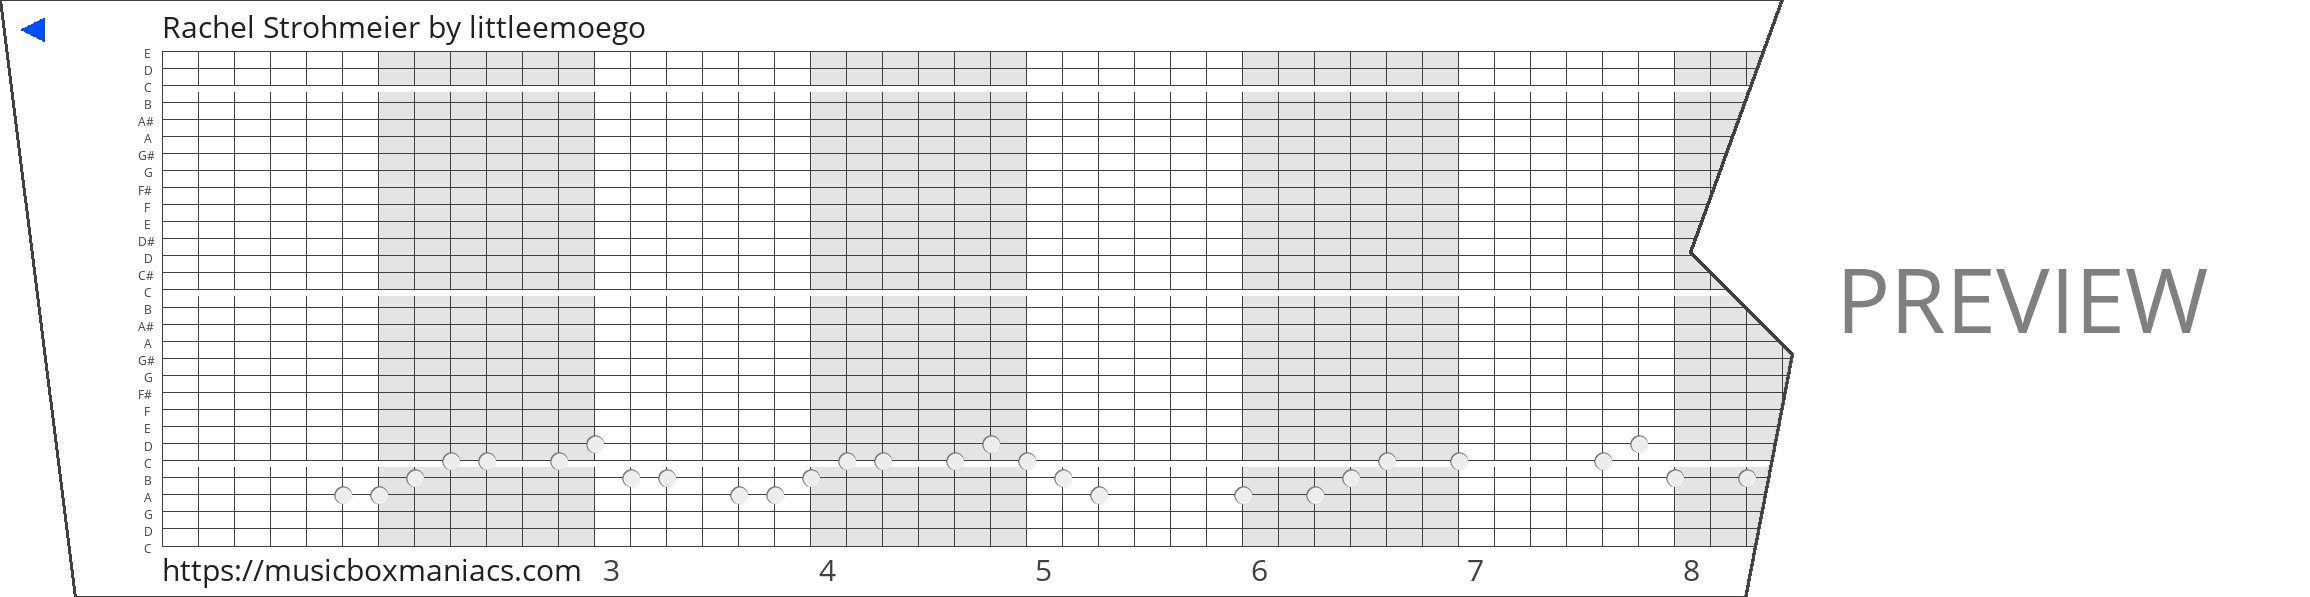 Rachel Strohmeier 30 note music box paper strip